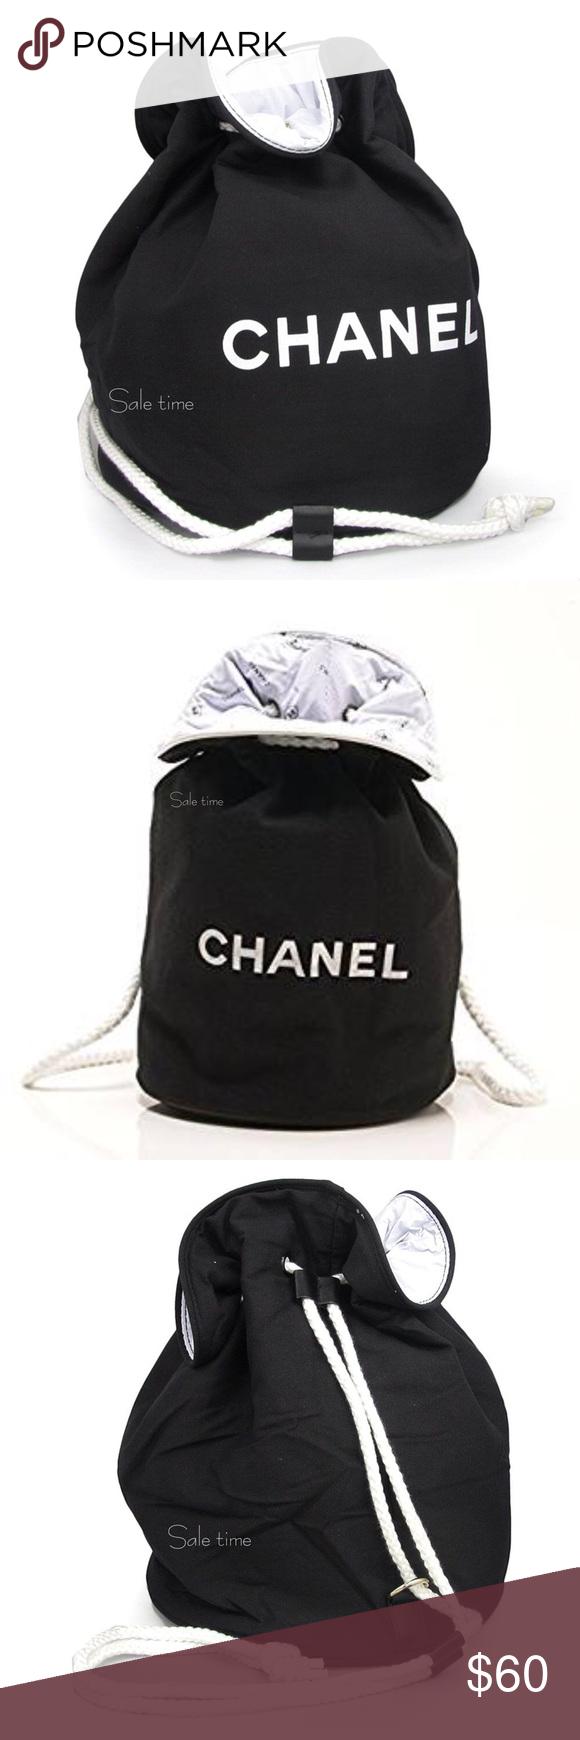 Chanel gym bag XL new New CHANEL Makeup Chanel sale